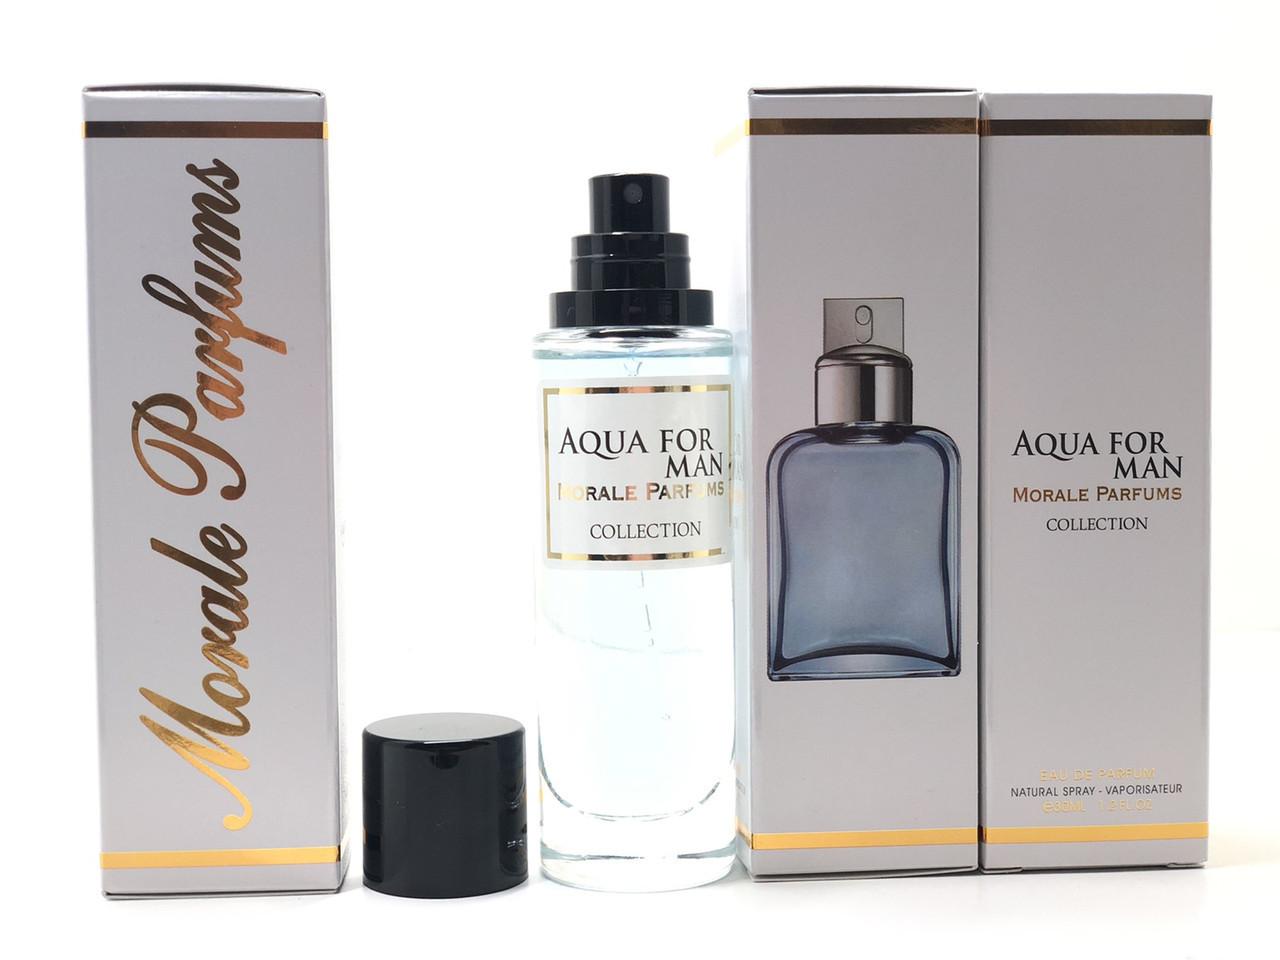 Чоловічий аромат Aqua For Man Morale Parfums (Аква Фо Мен Морал Парфум) 30 мл